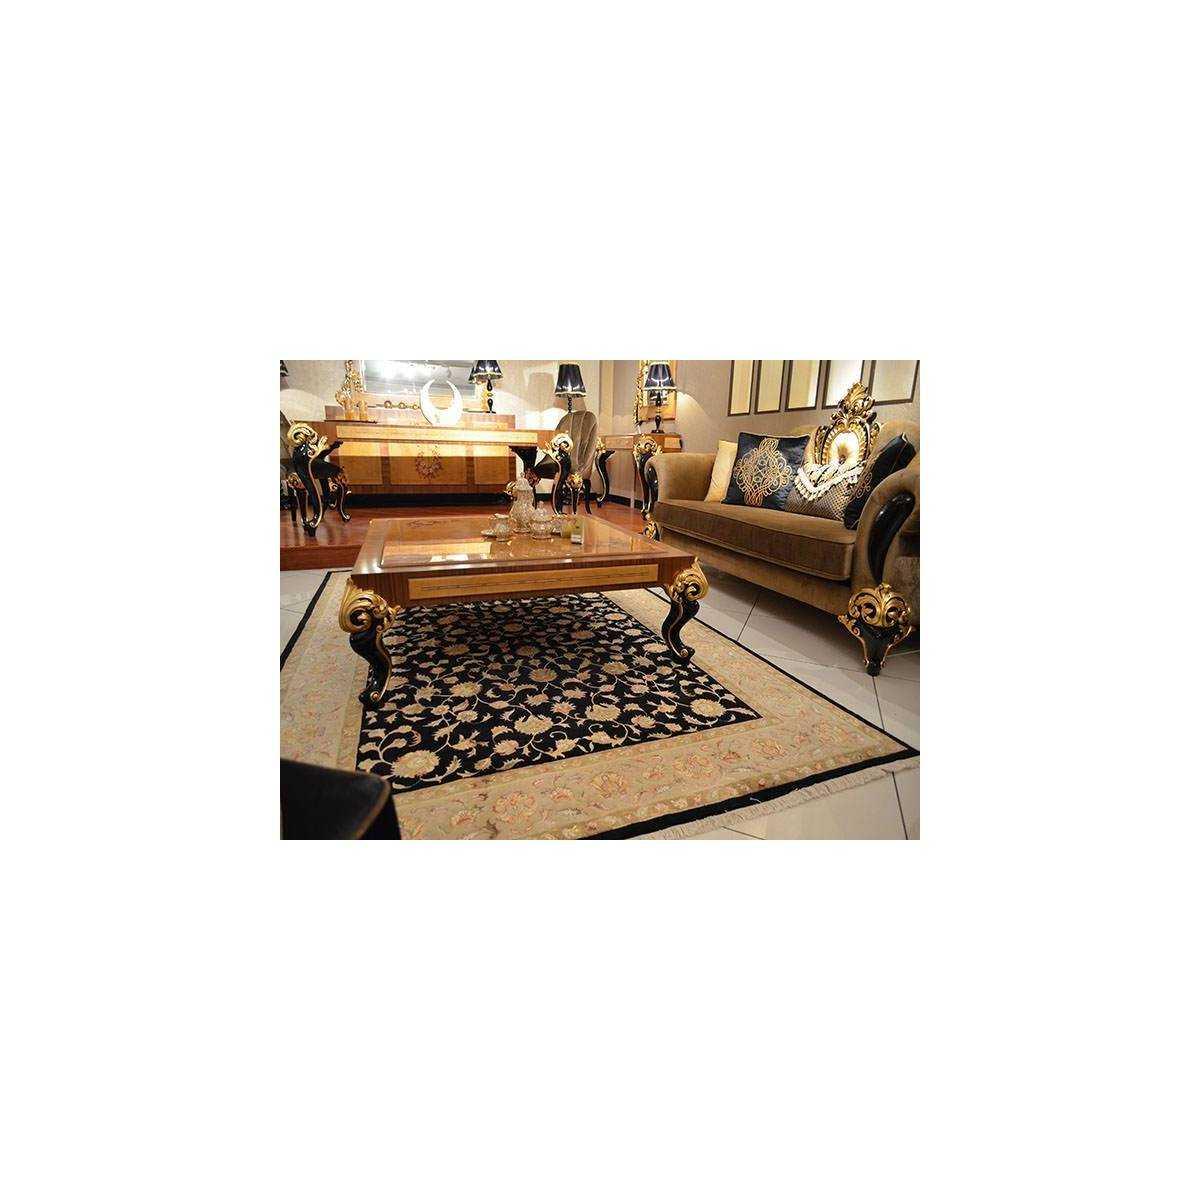 Ковры для дома carpet-home.02 HASKUL HALI